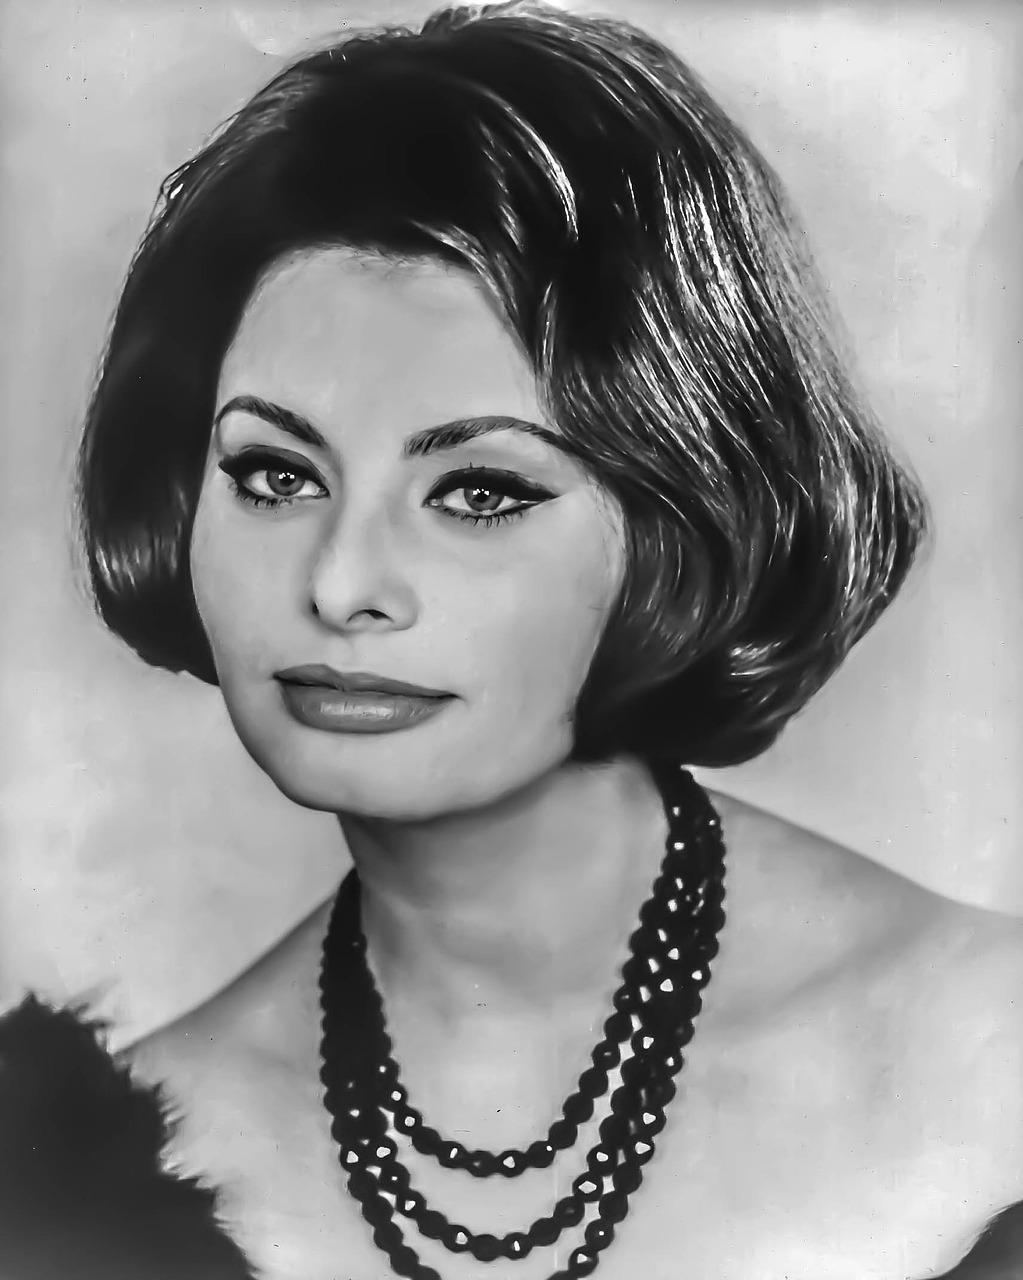 Sophia Loren Femminile Ritratto - Foto gratis su Pixabay